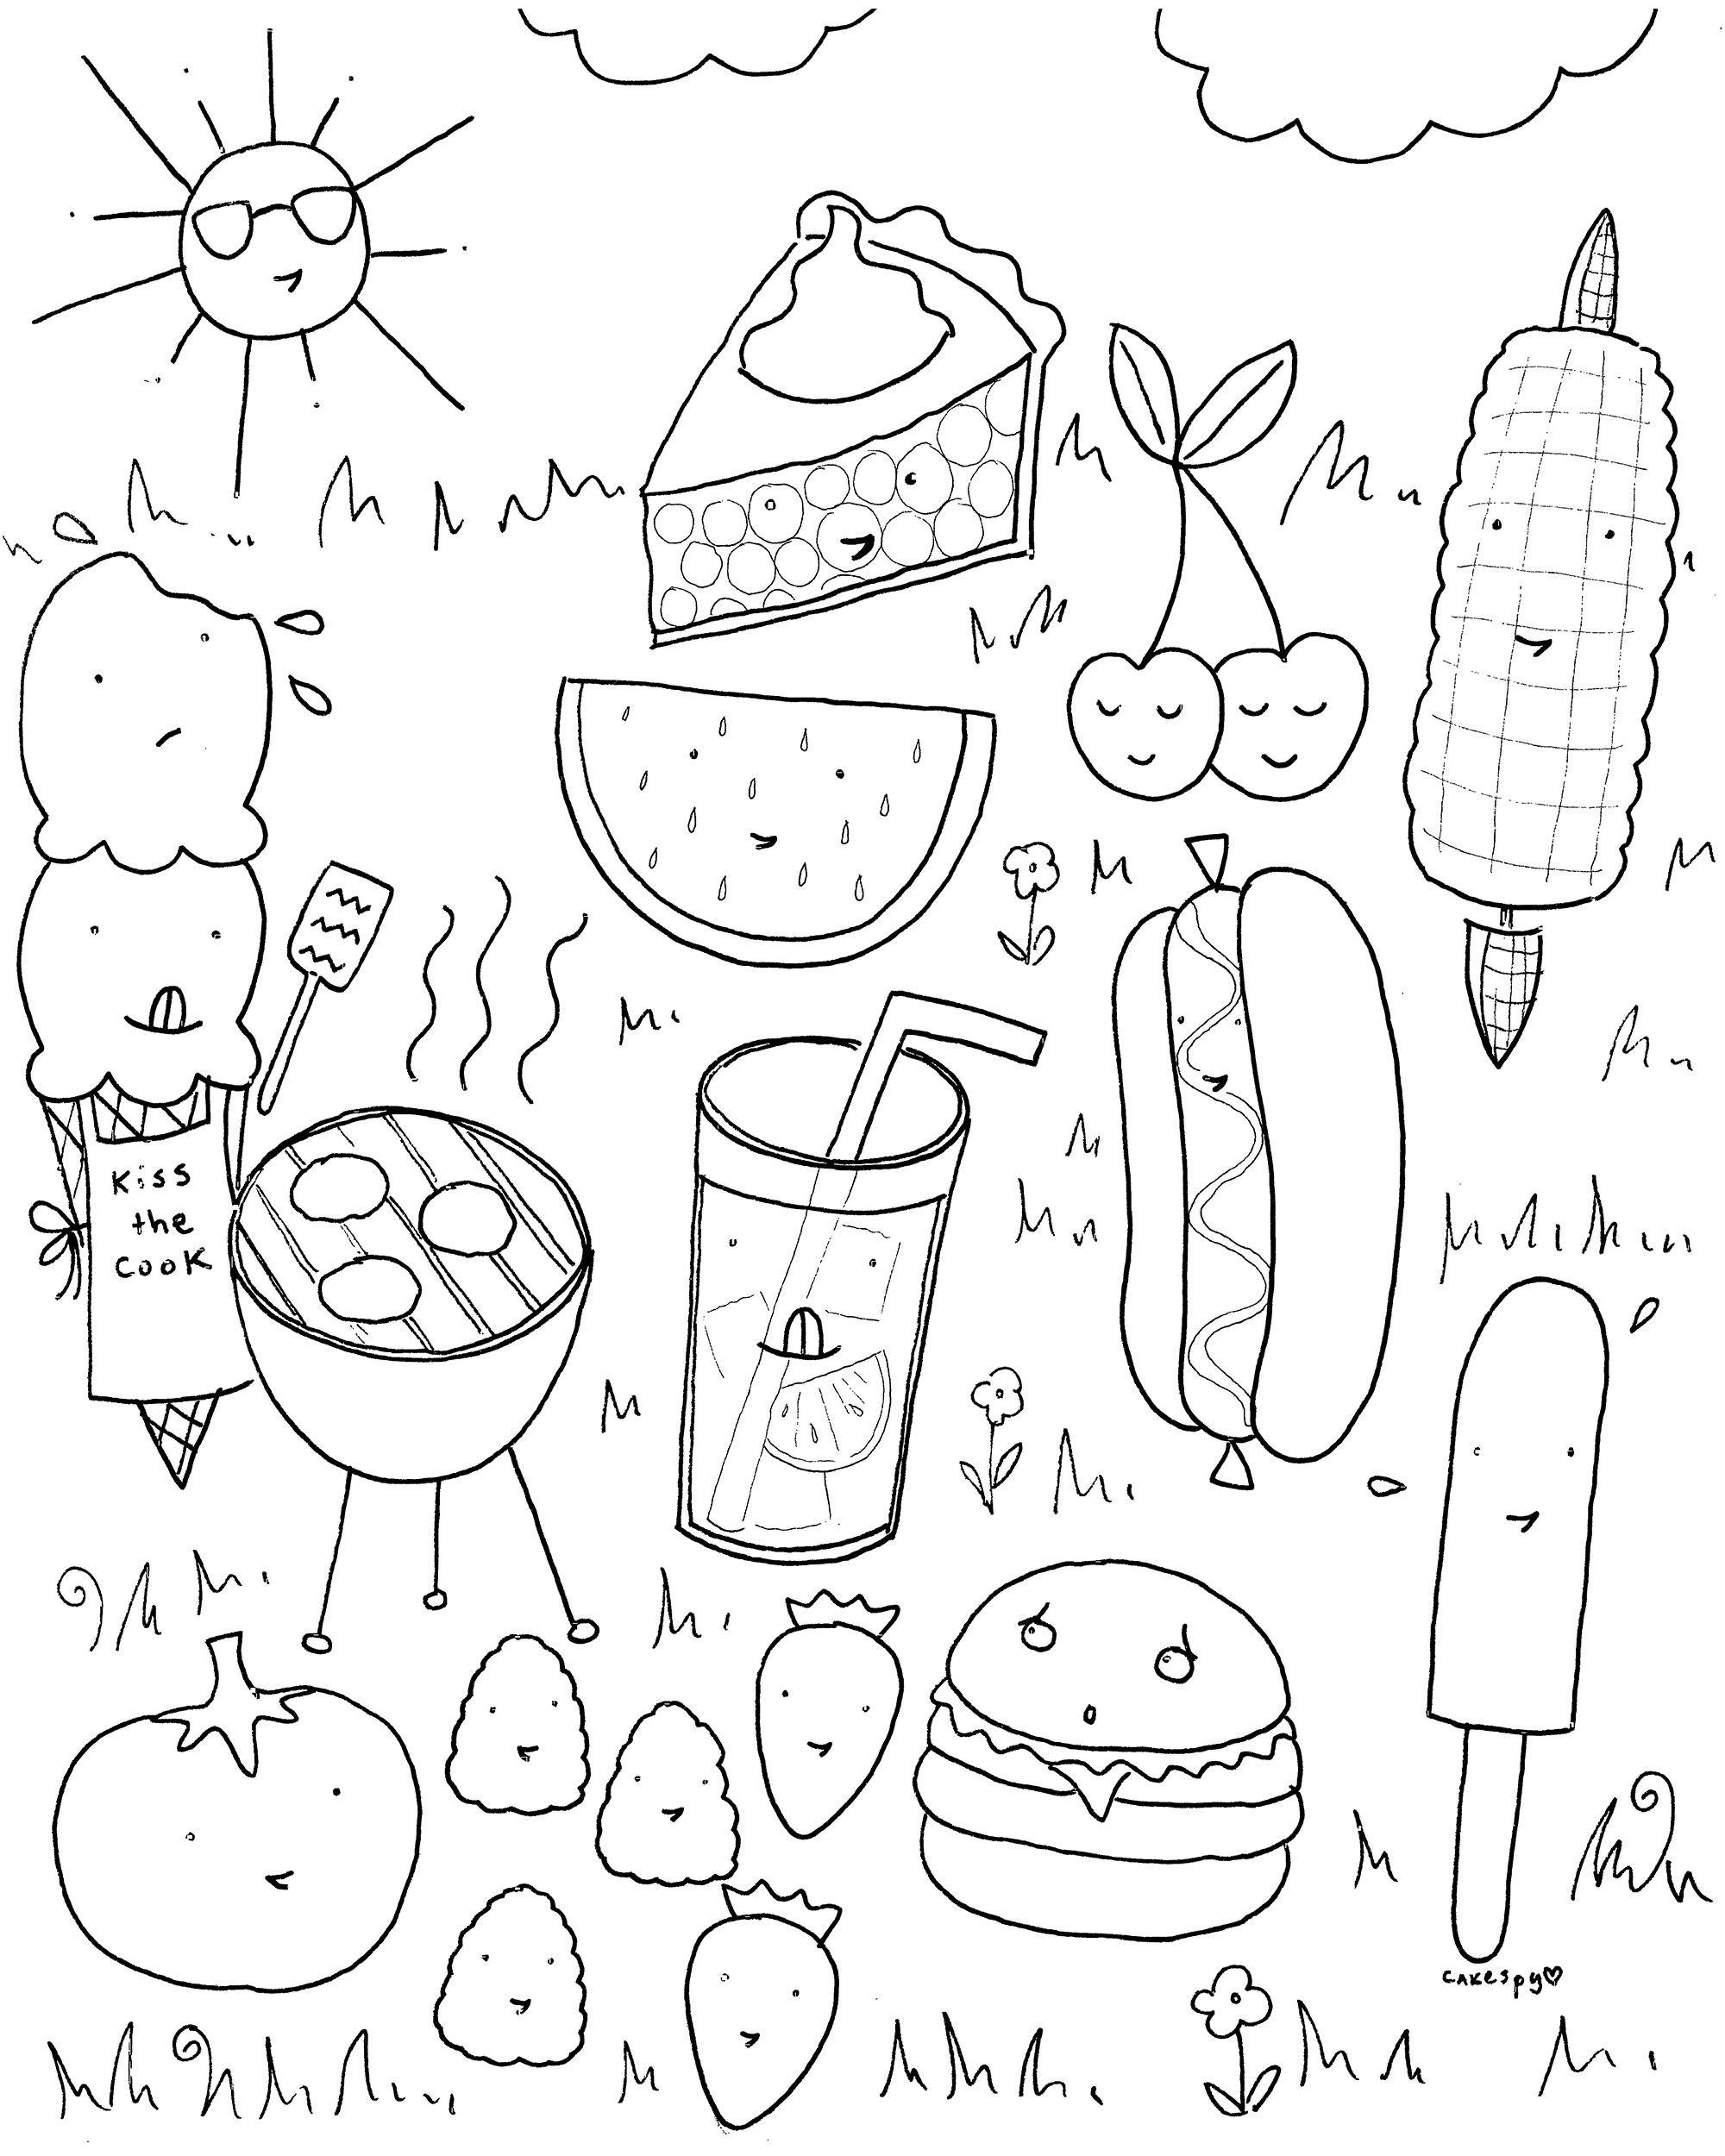 2000x2500 Coloring Pages Of Kawaii Food Best Of Cute Kawaii Food Coloring